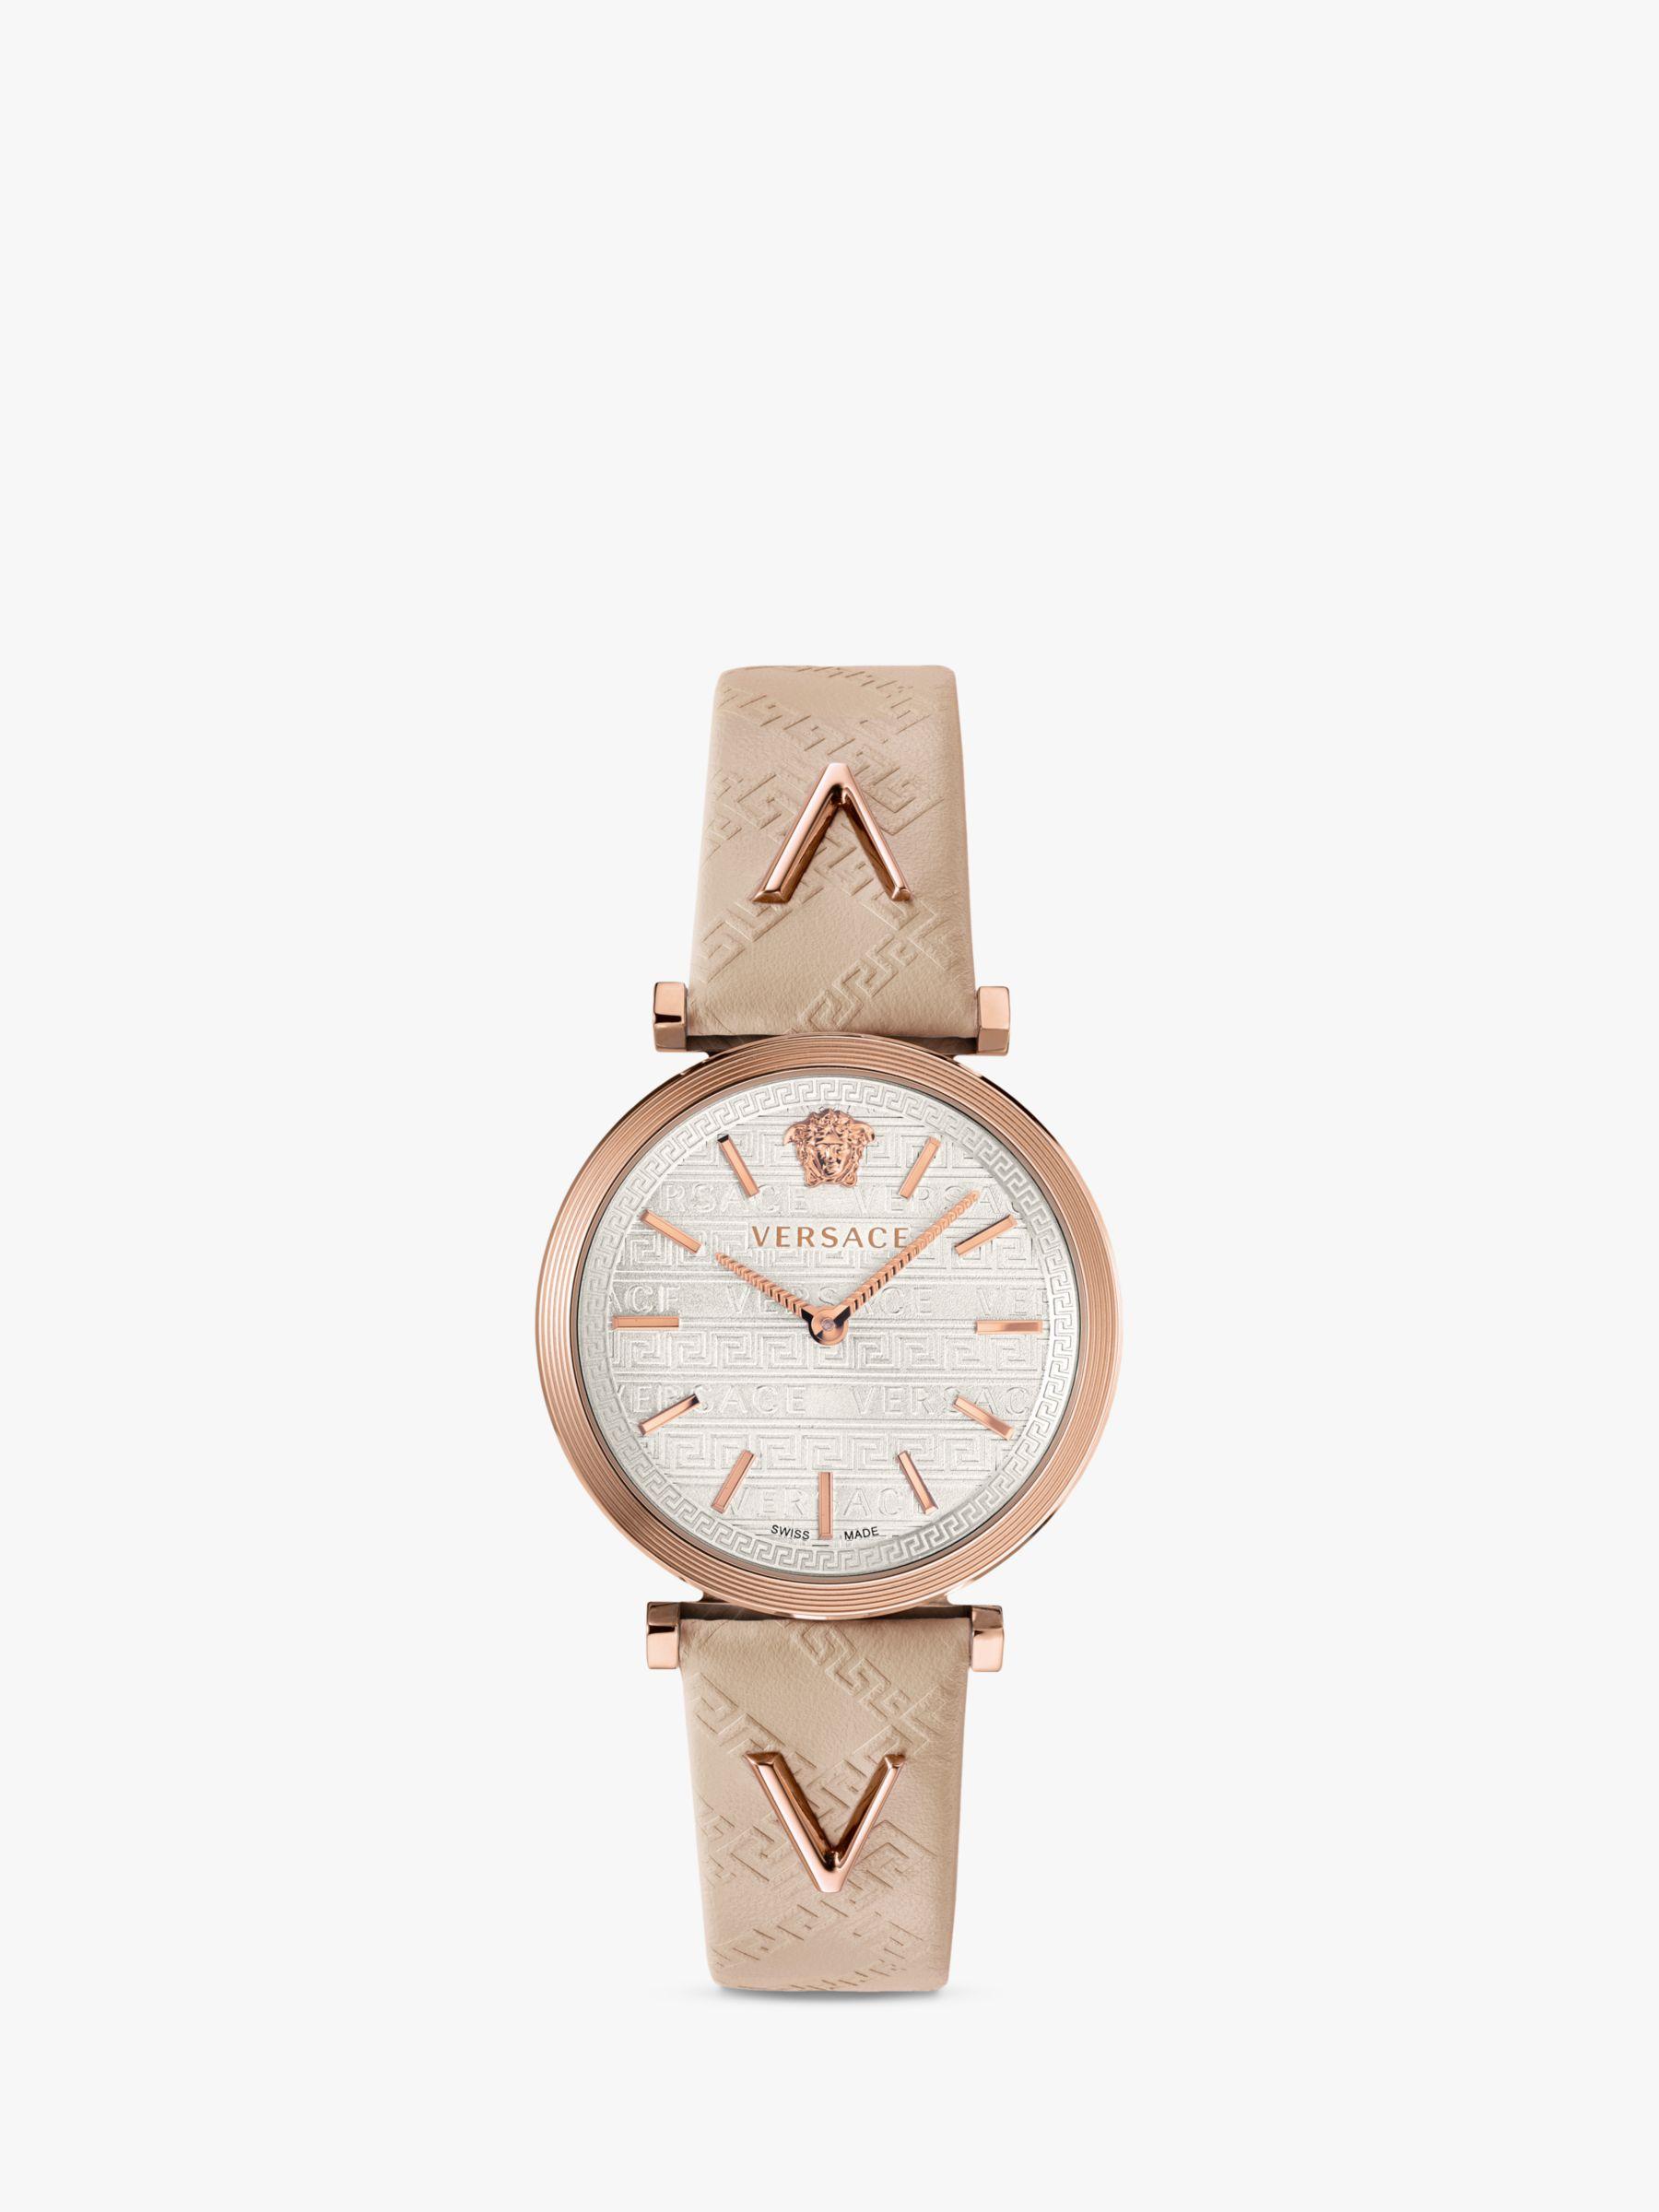 Versace Versace VELS00419 Women's Twist Leather Strap Watch, Greyq